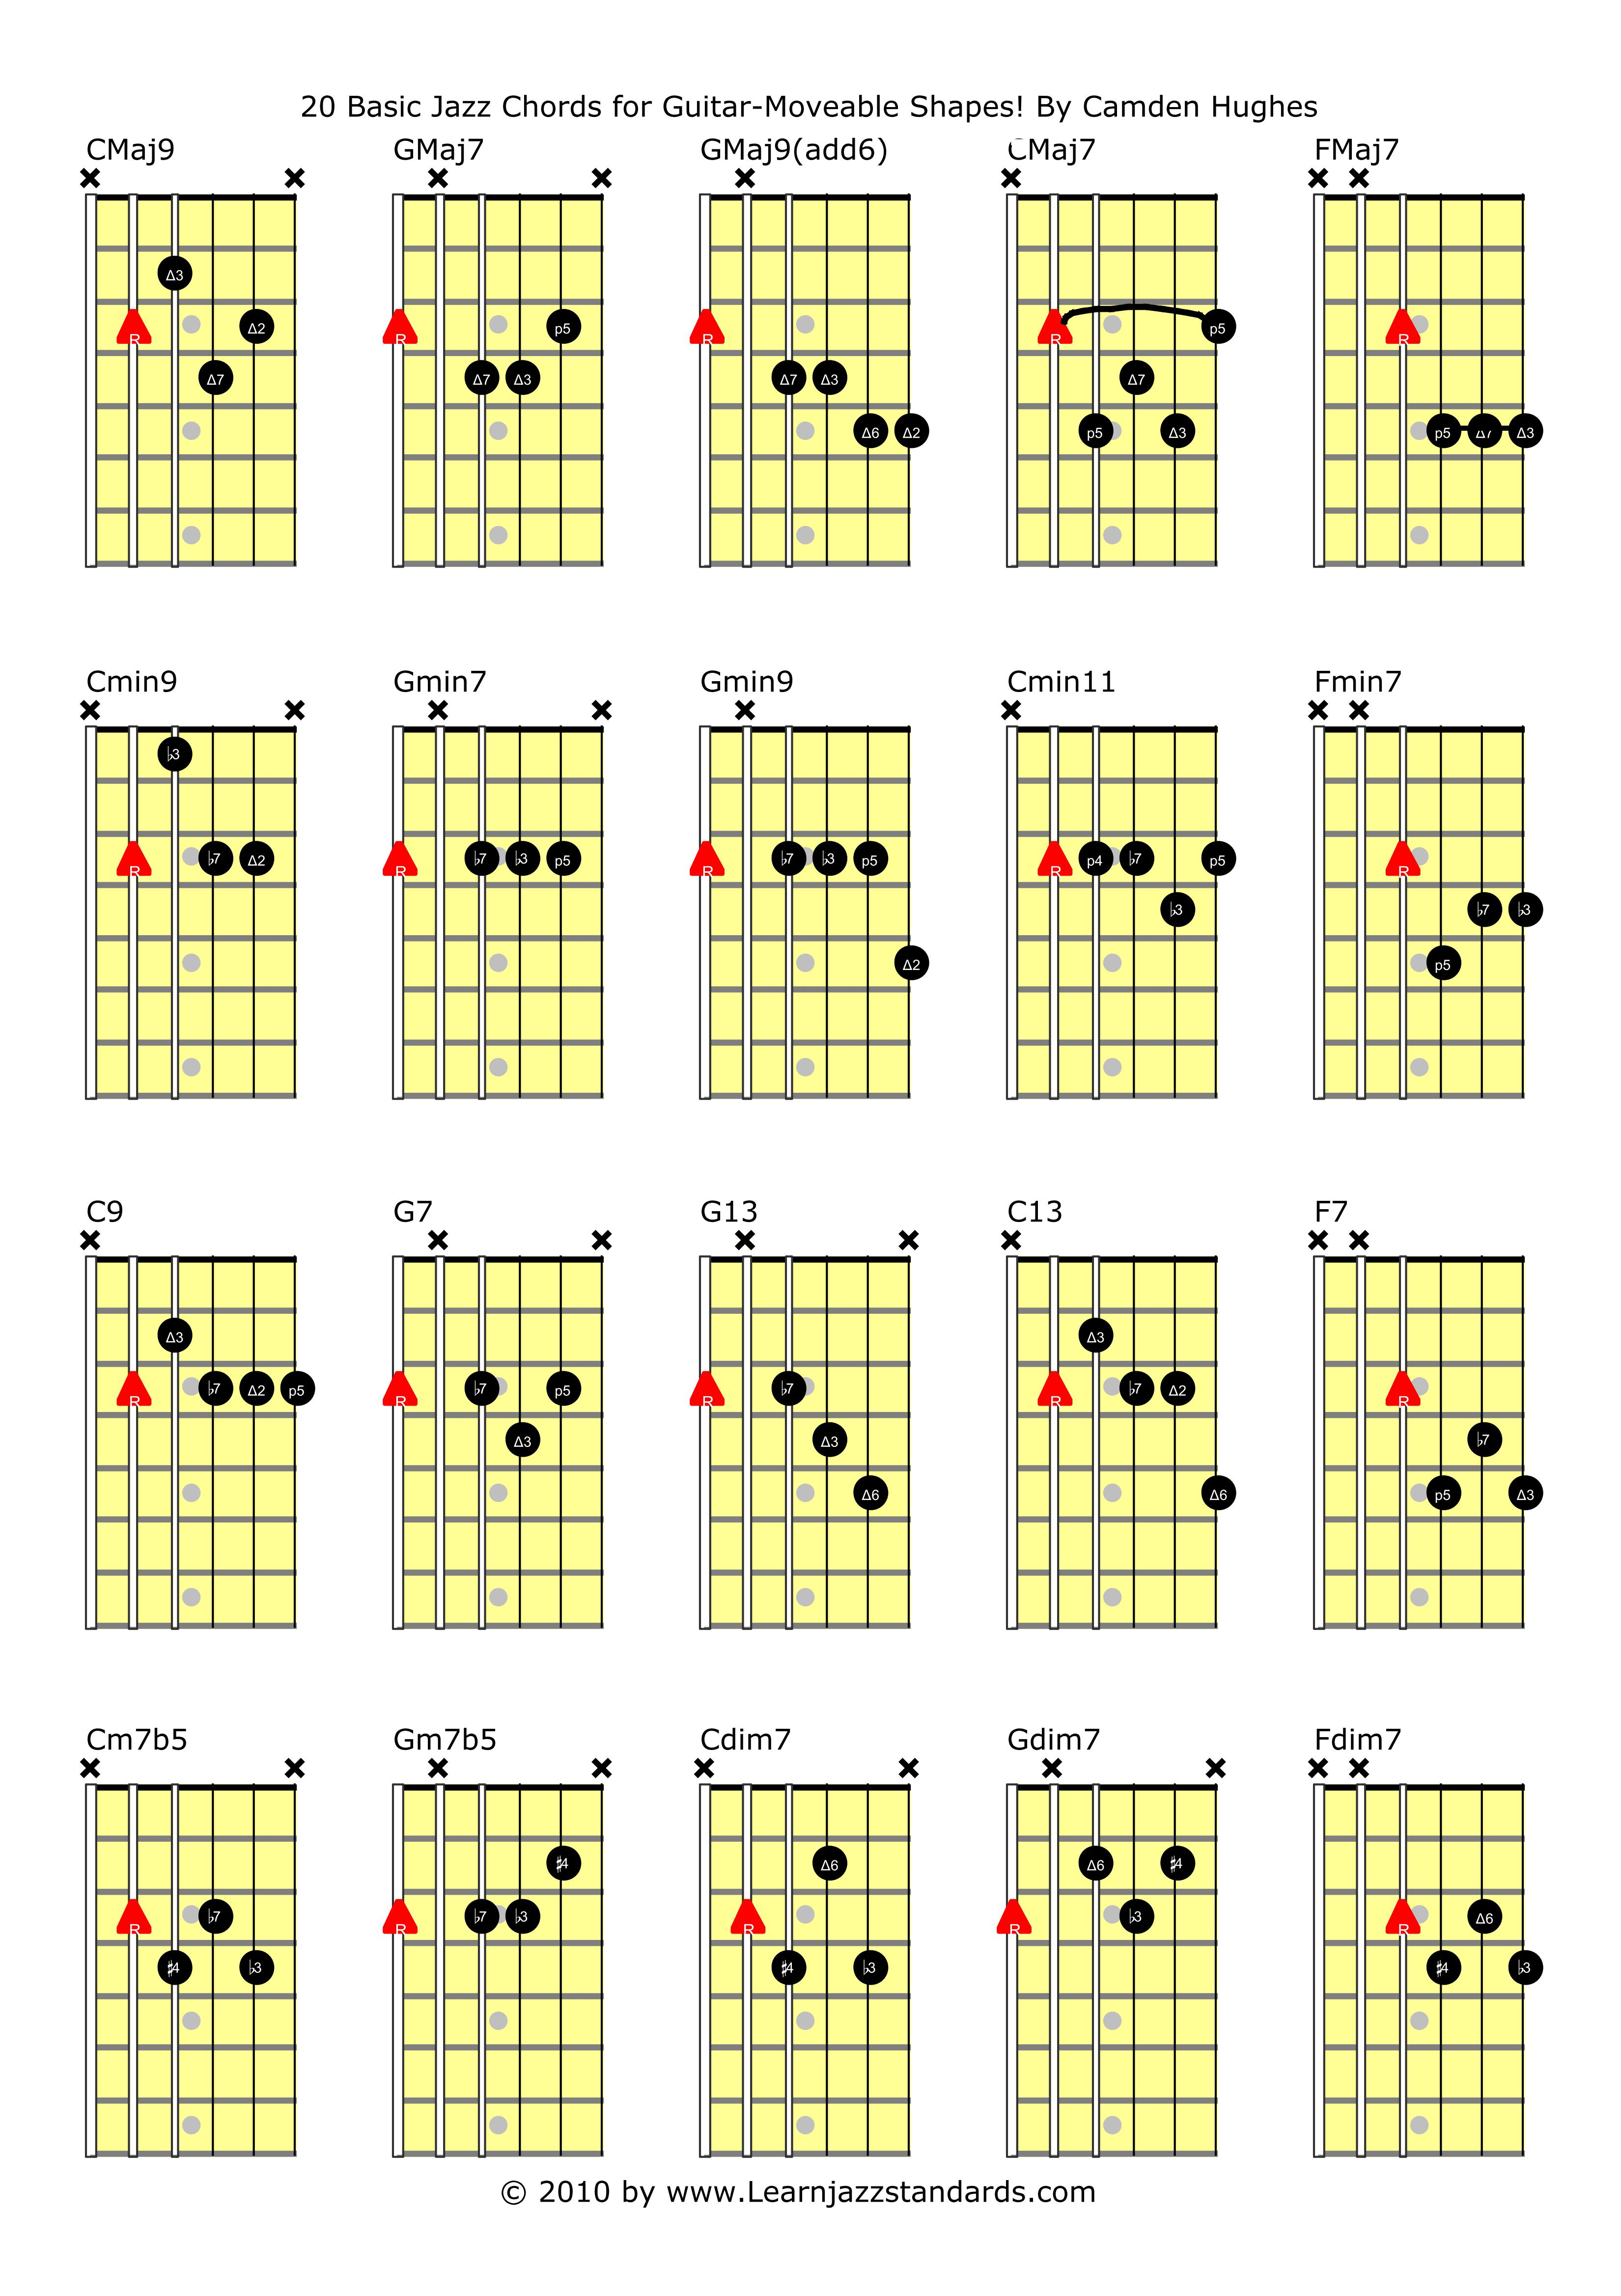 Guitar Chords For Beginners 20 Basic Jazz Chords For Guitar Learn Jazz Standards